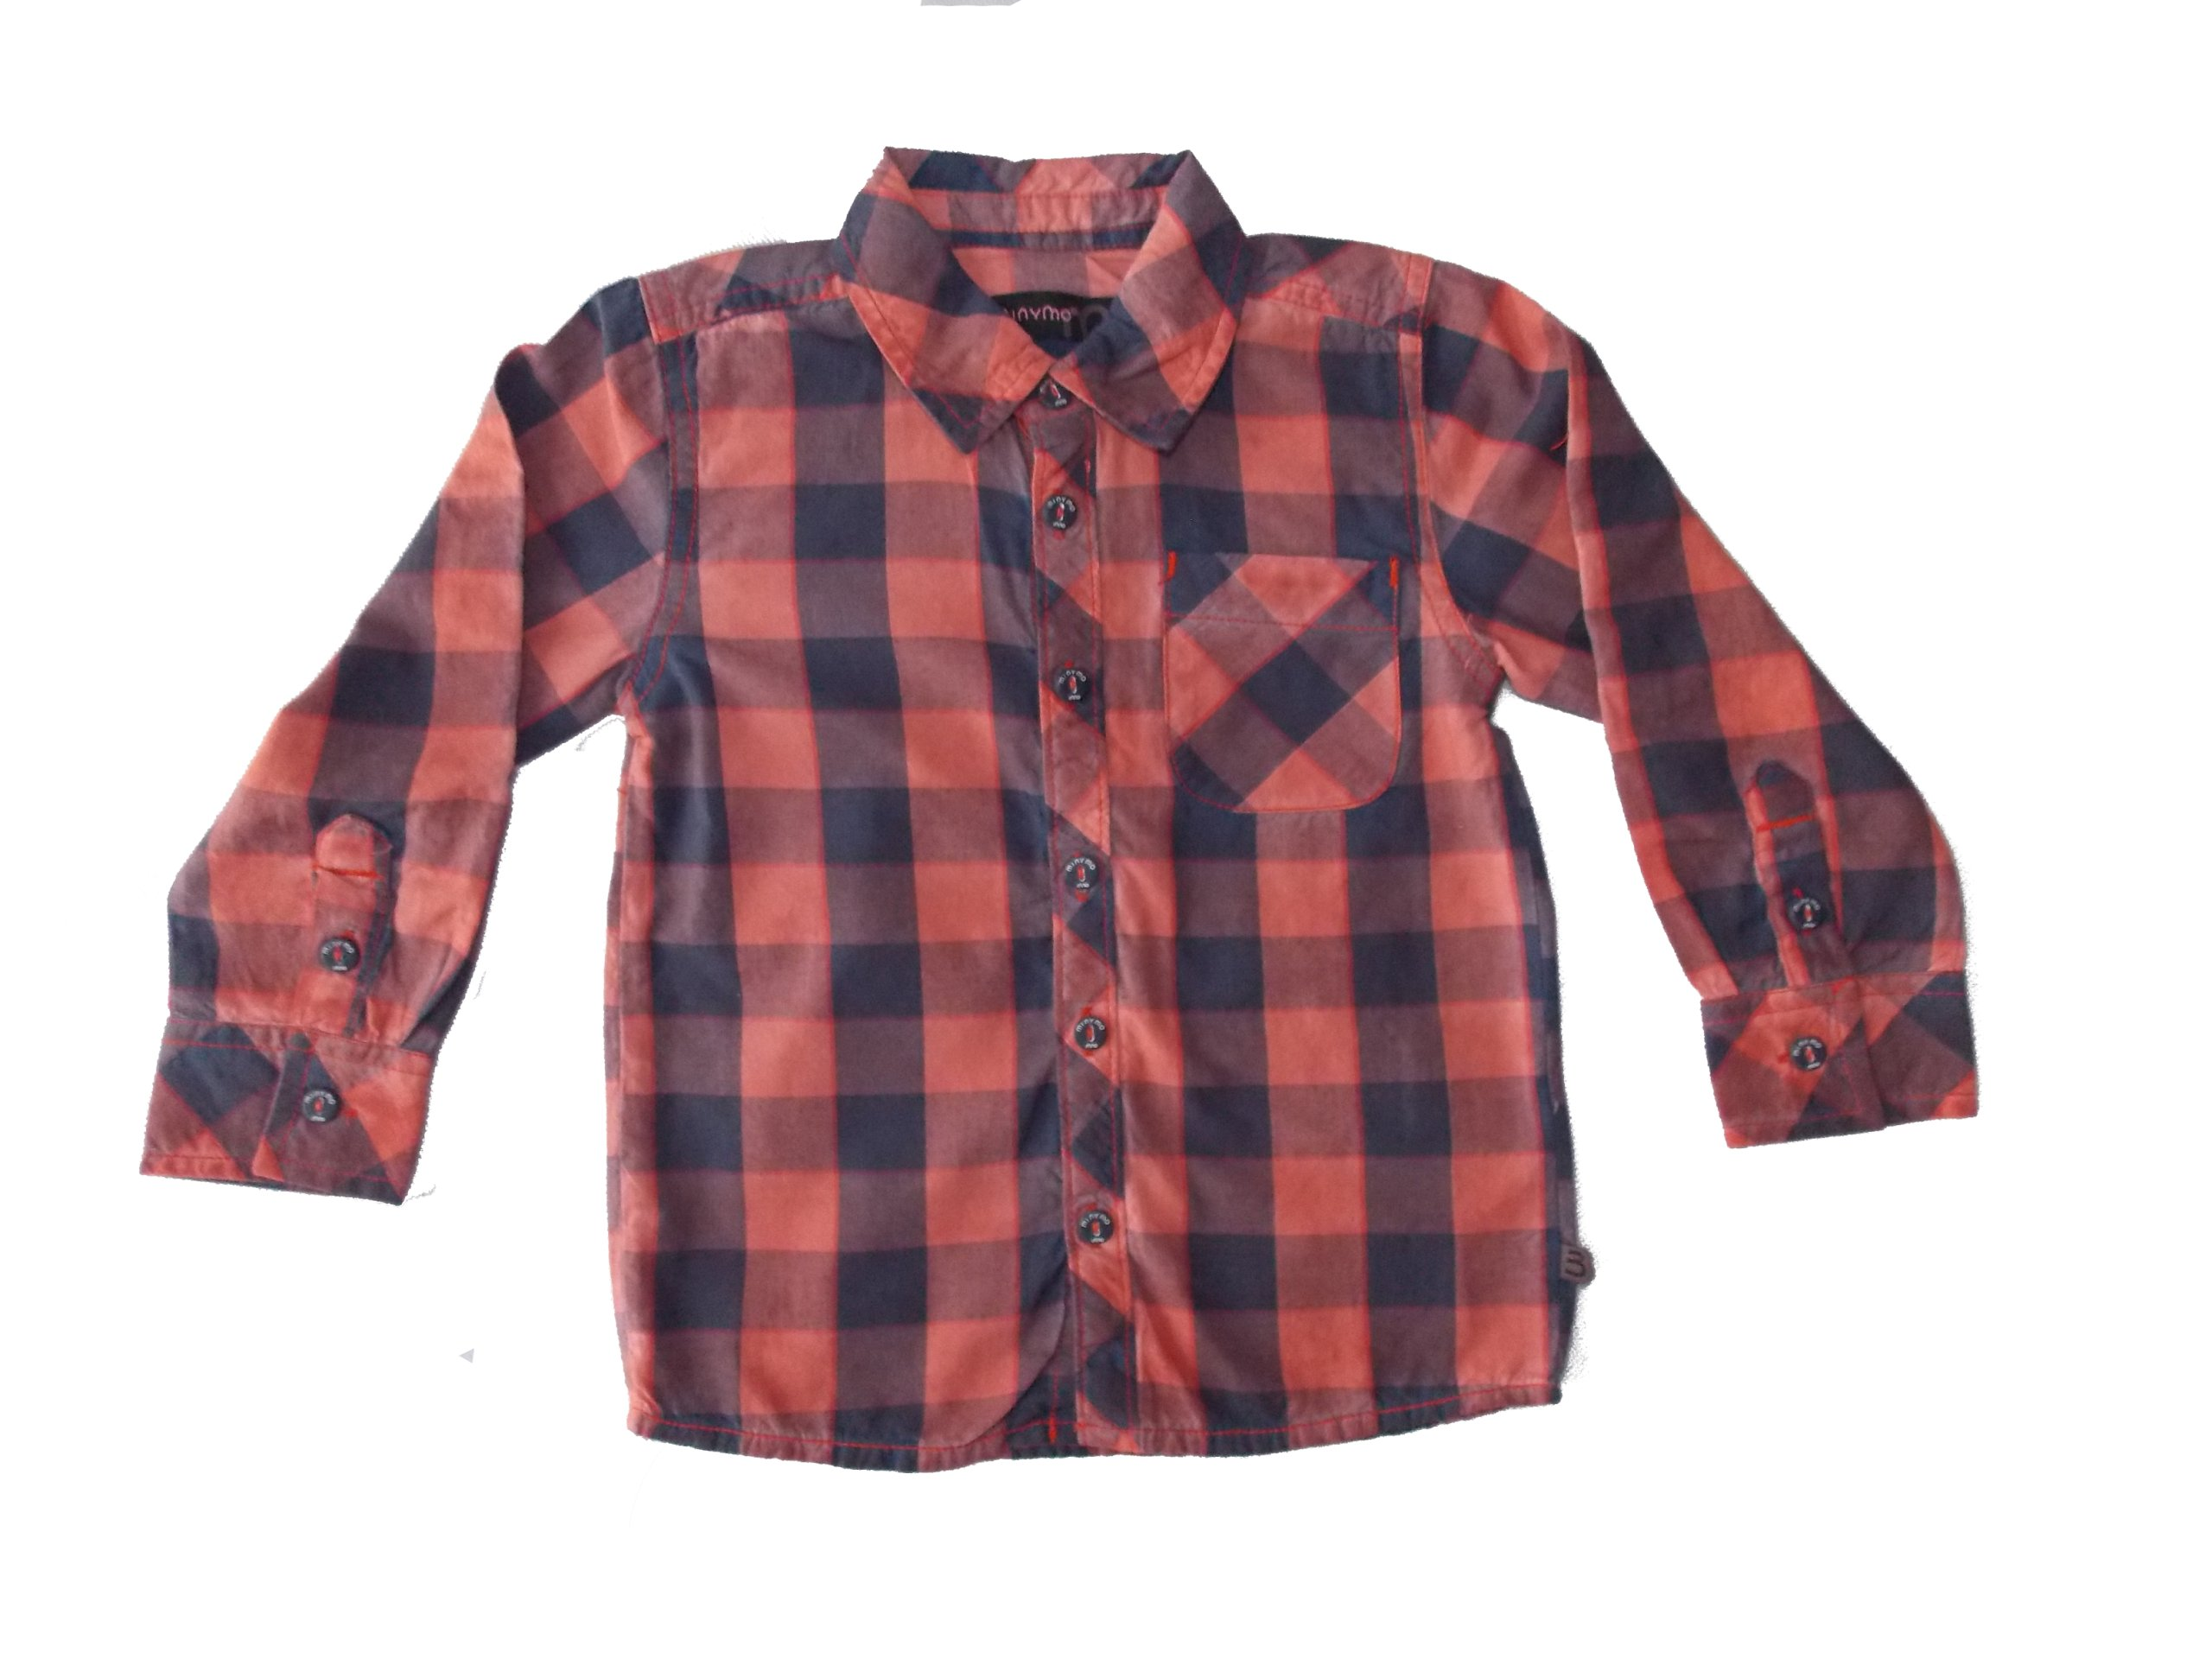 MINYMO koszula w kratę kratkę 92 18 24 1,5 2 7181280066  oJr2l